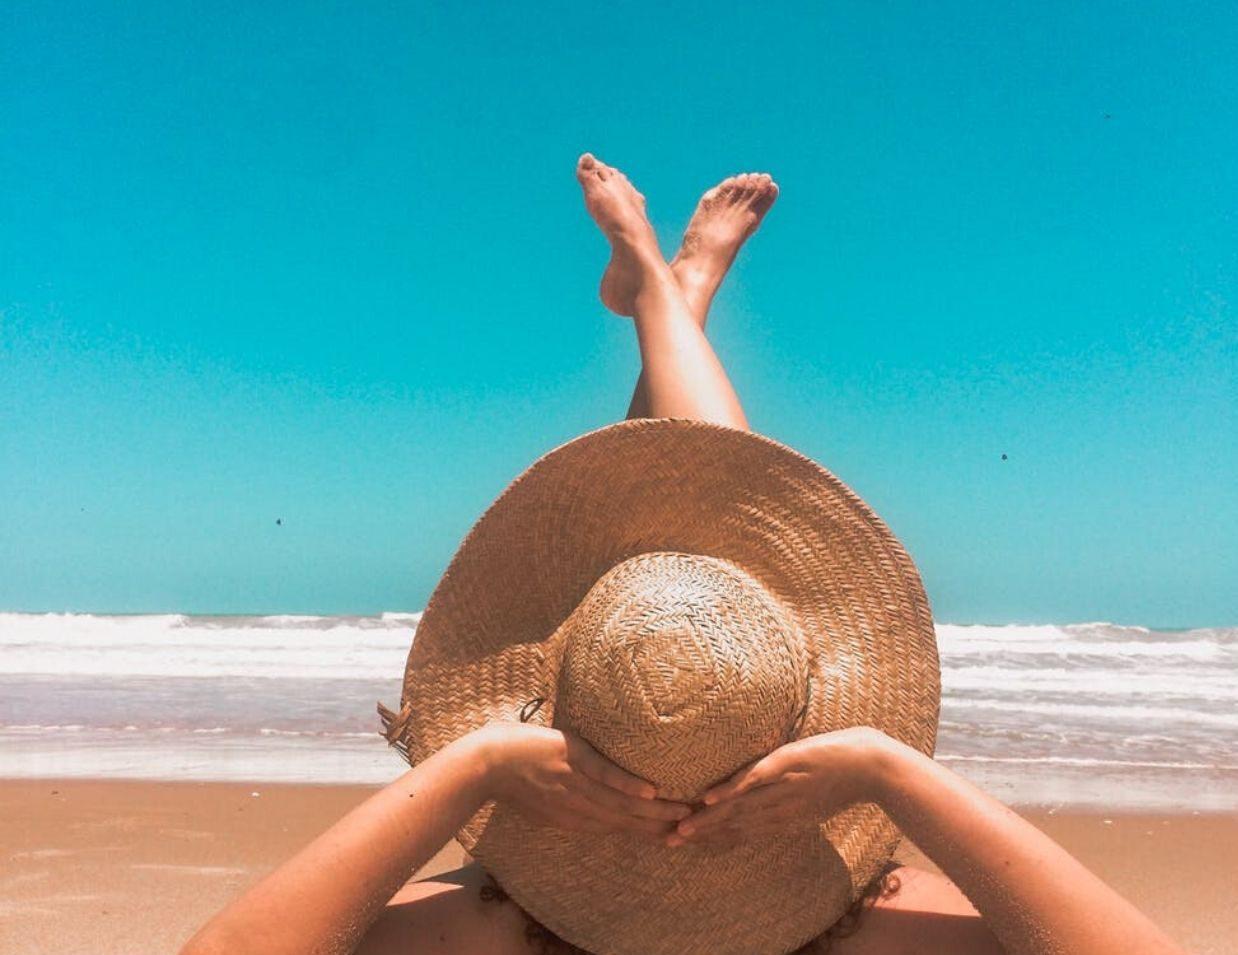 spiagge nudisti Romagna